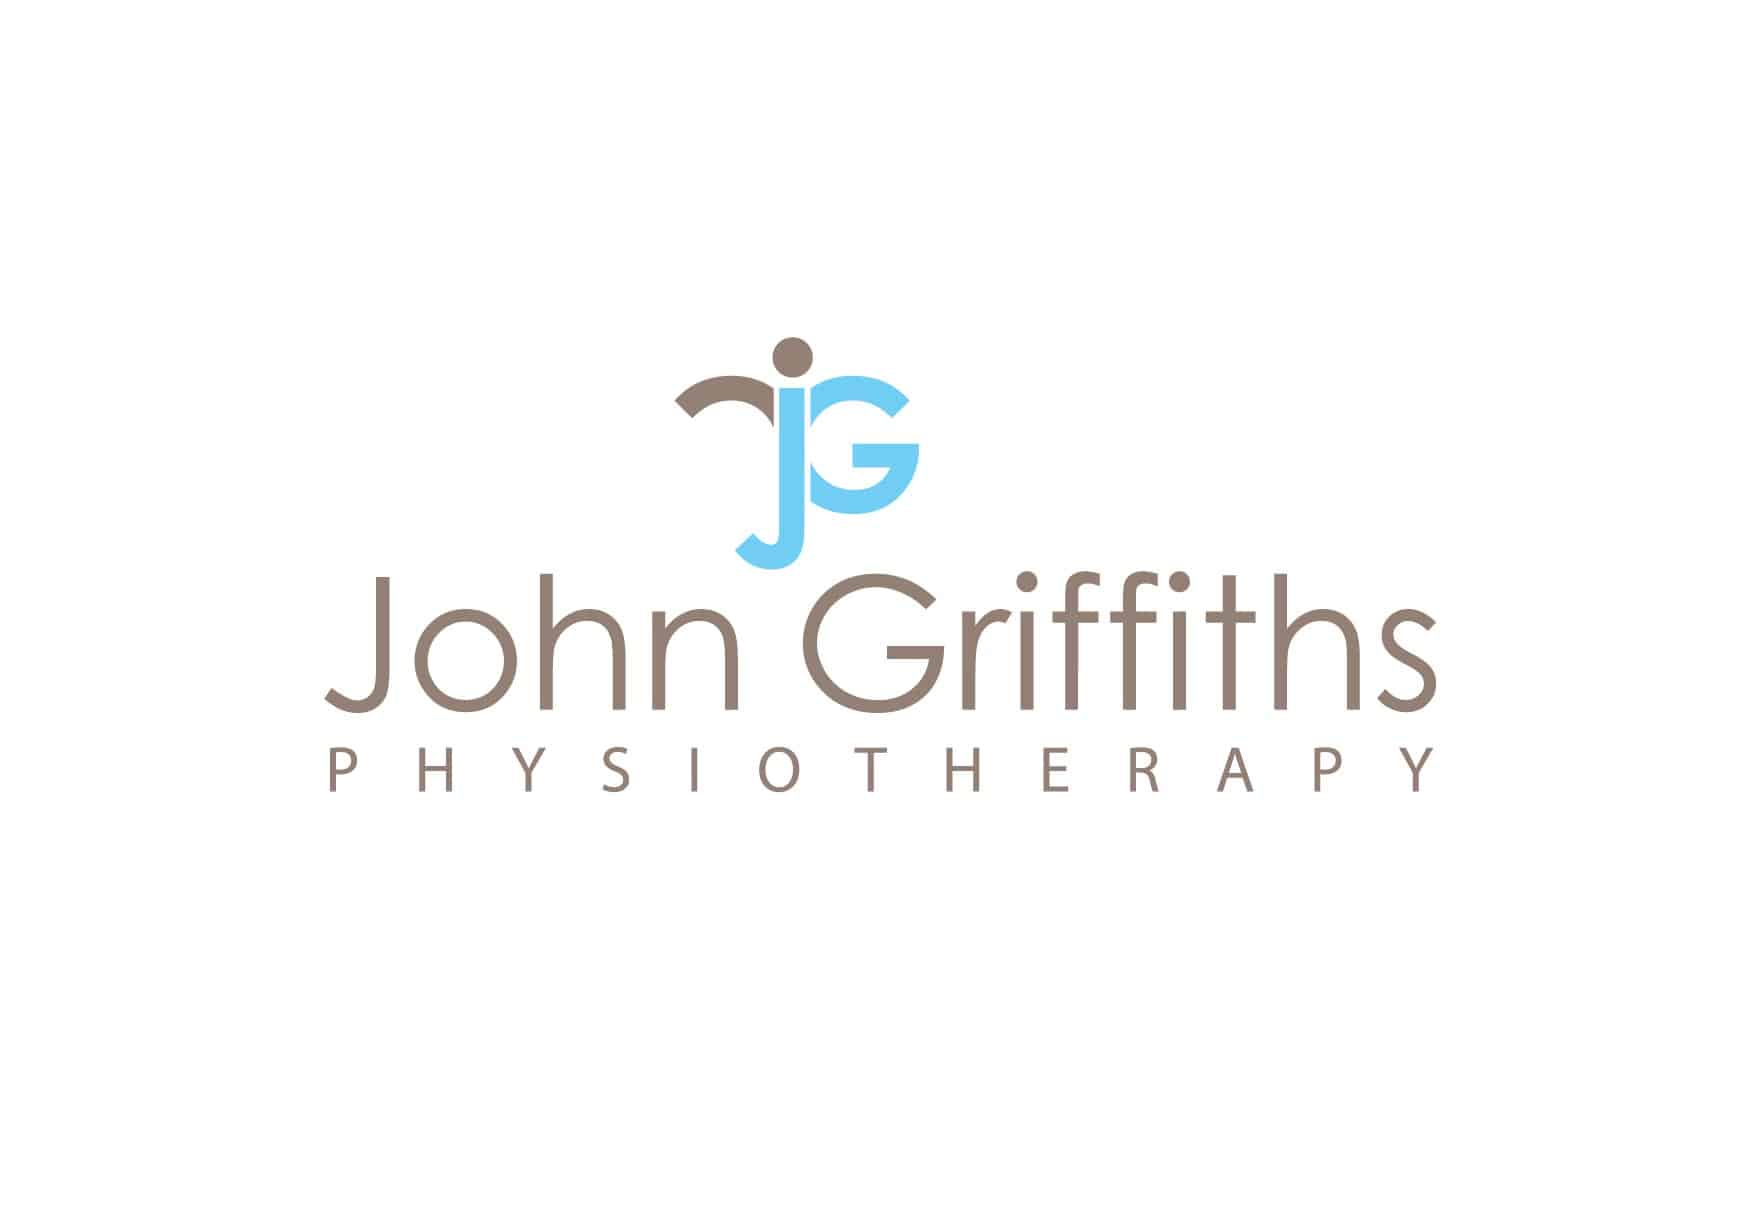 john-griffiths-physio-logo-design